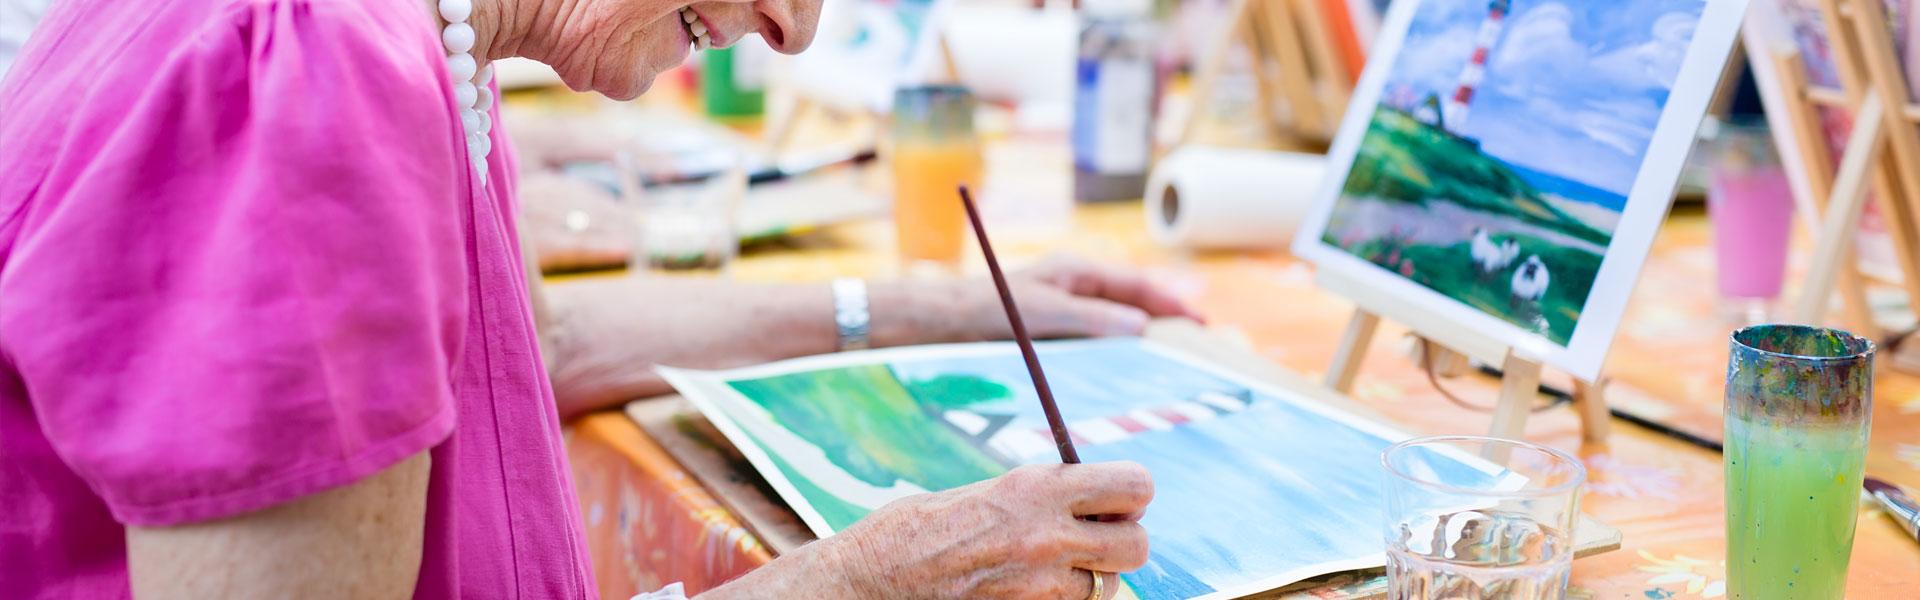 Woman Painting, Fleet Landing